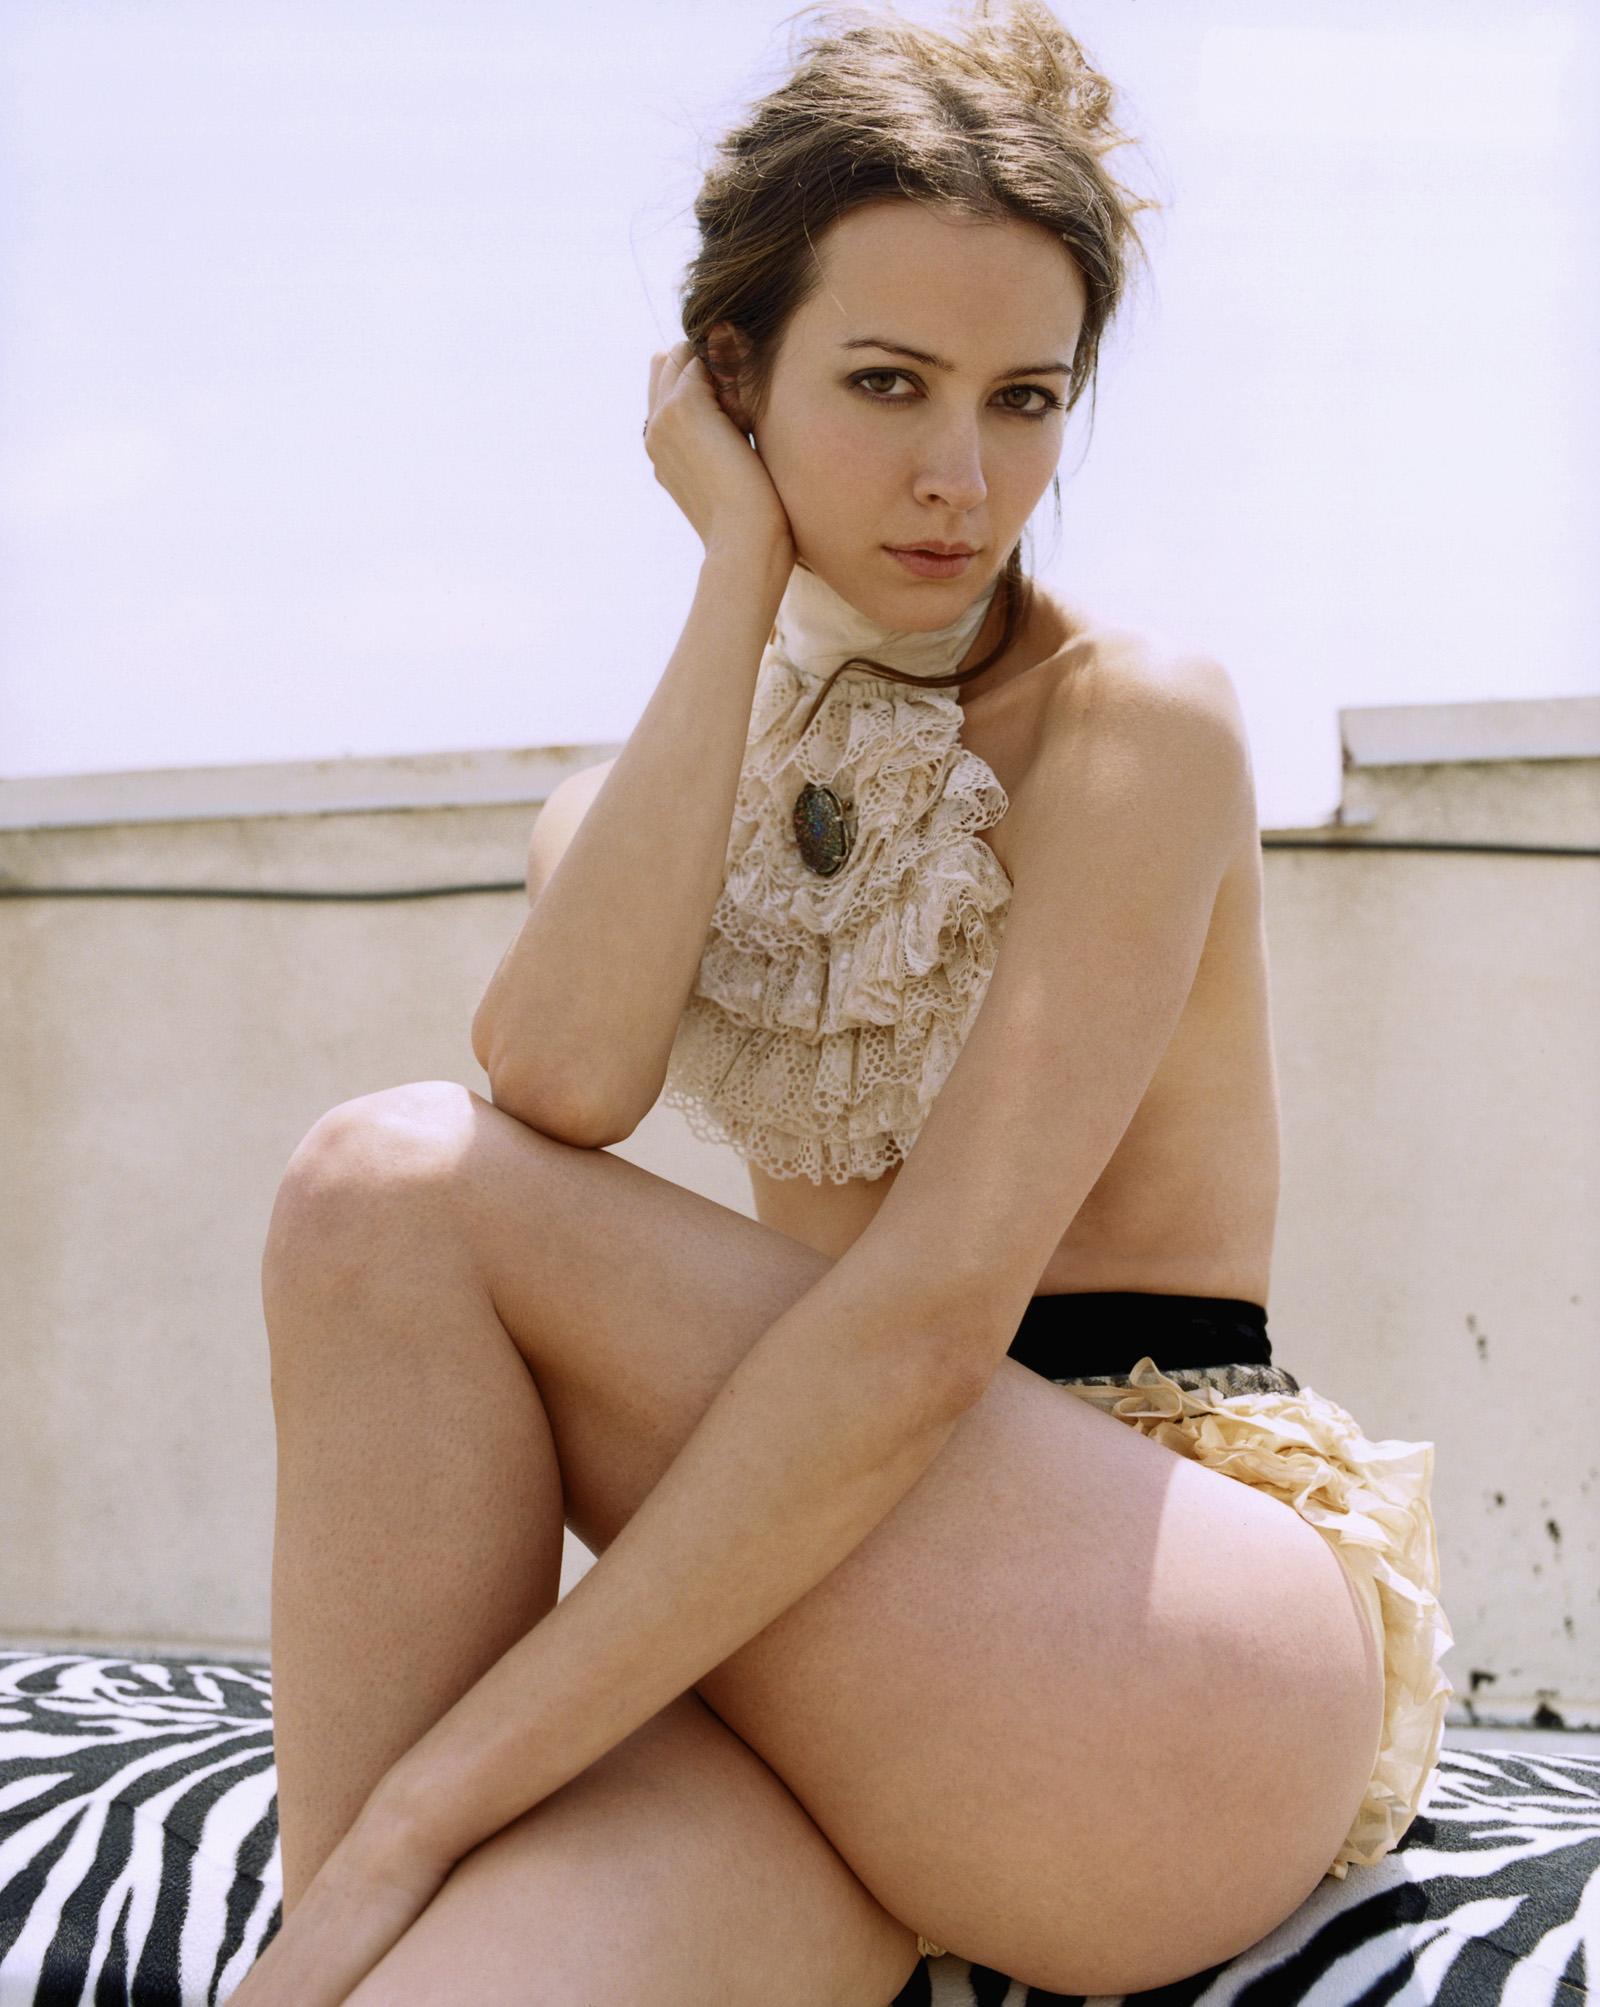 Amy acker nude photo